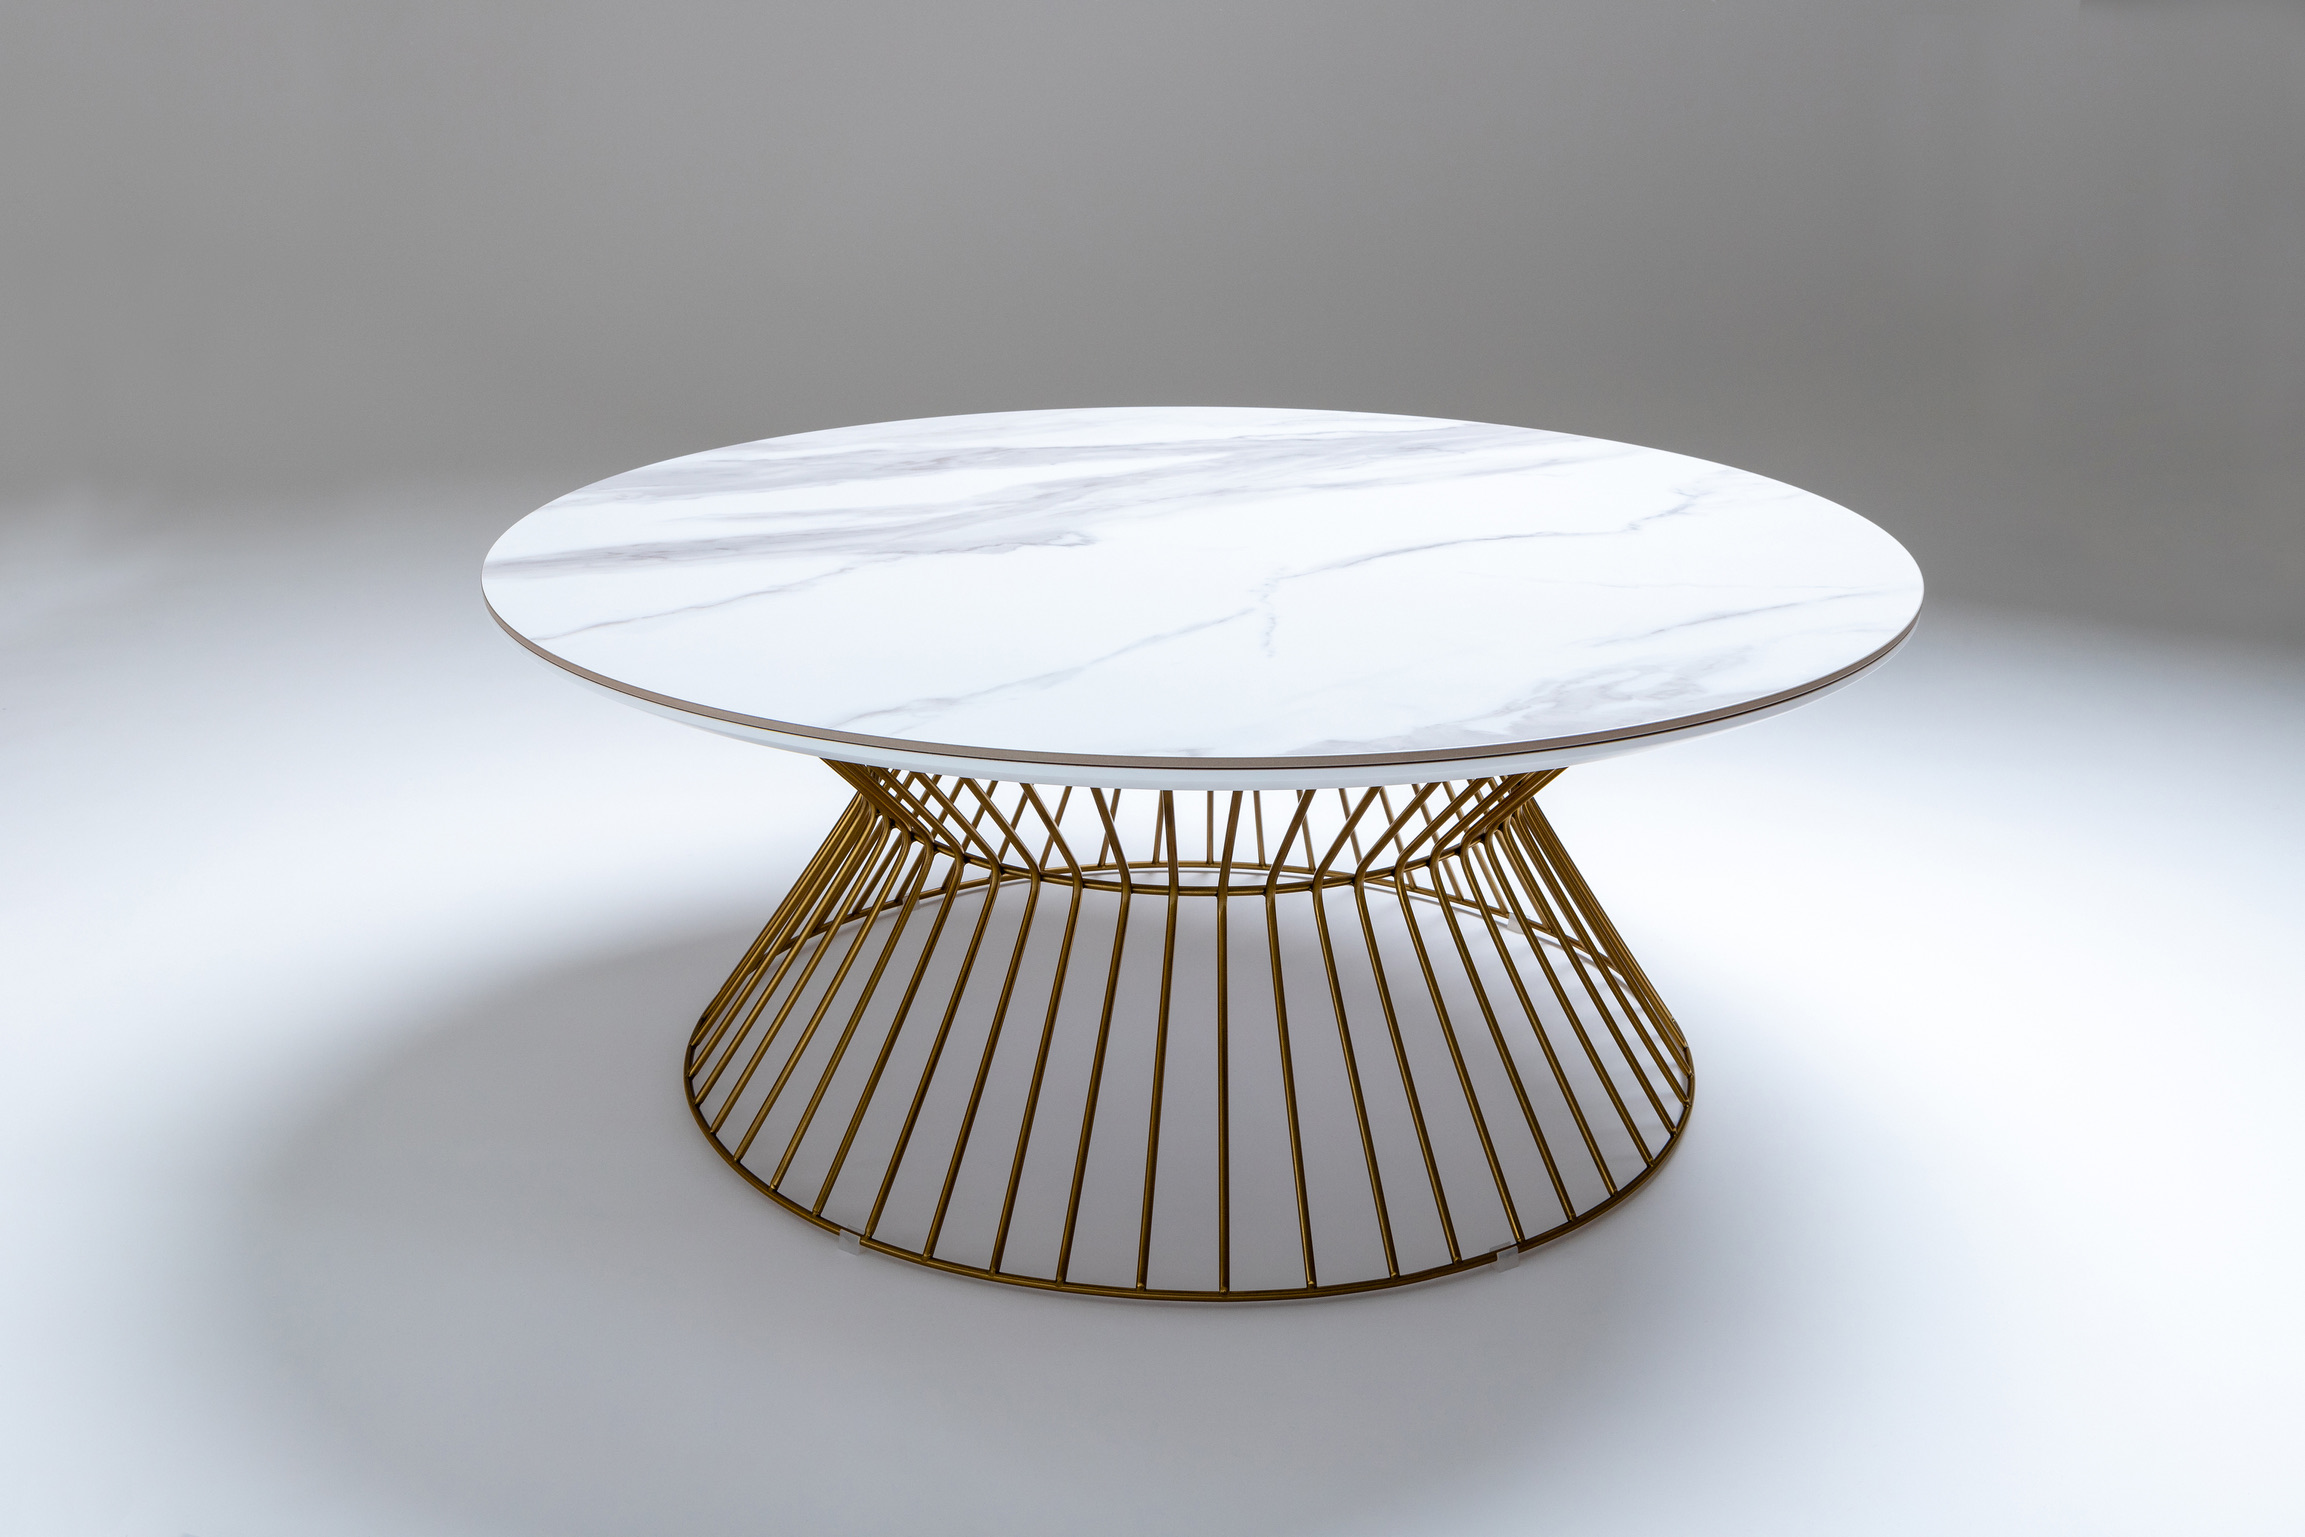 Cage Circular Coffee Table